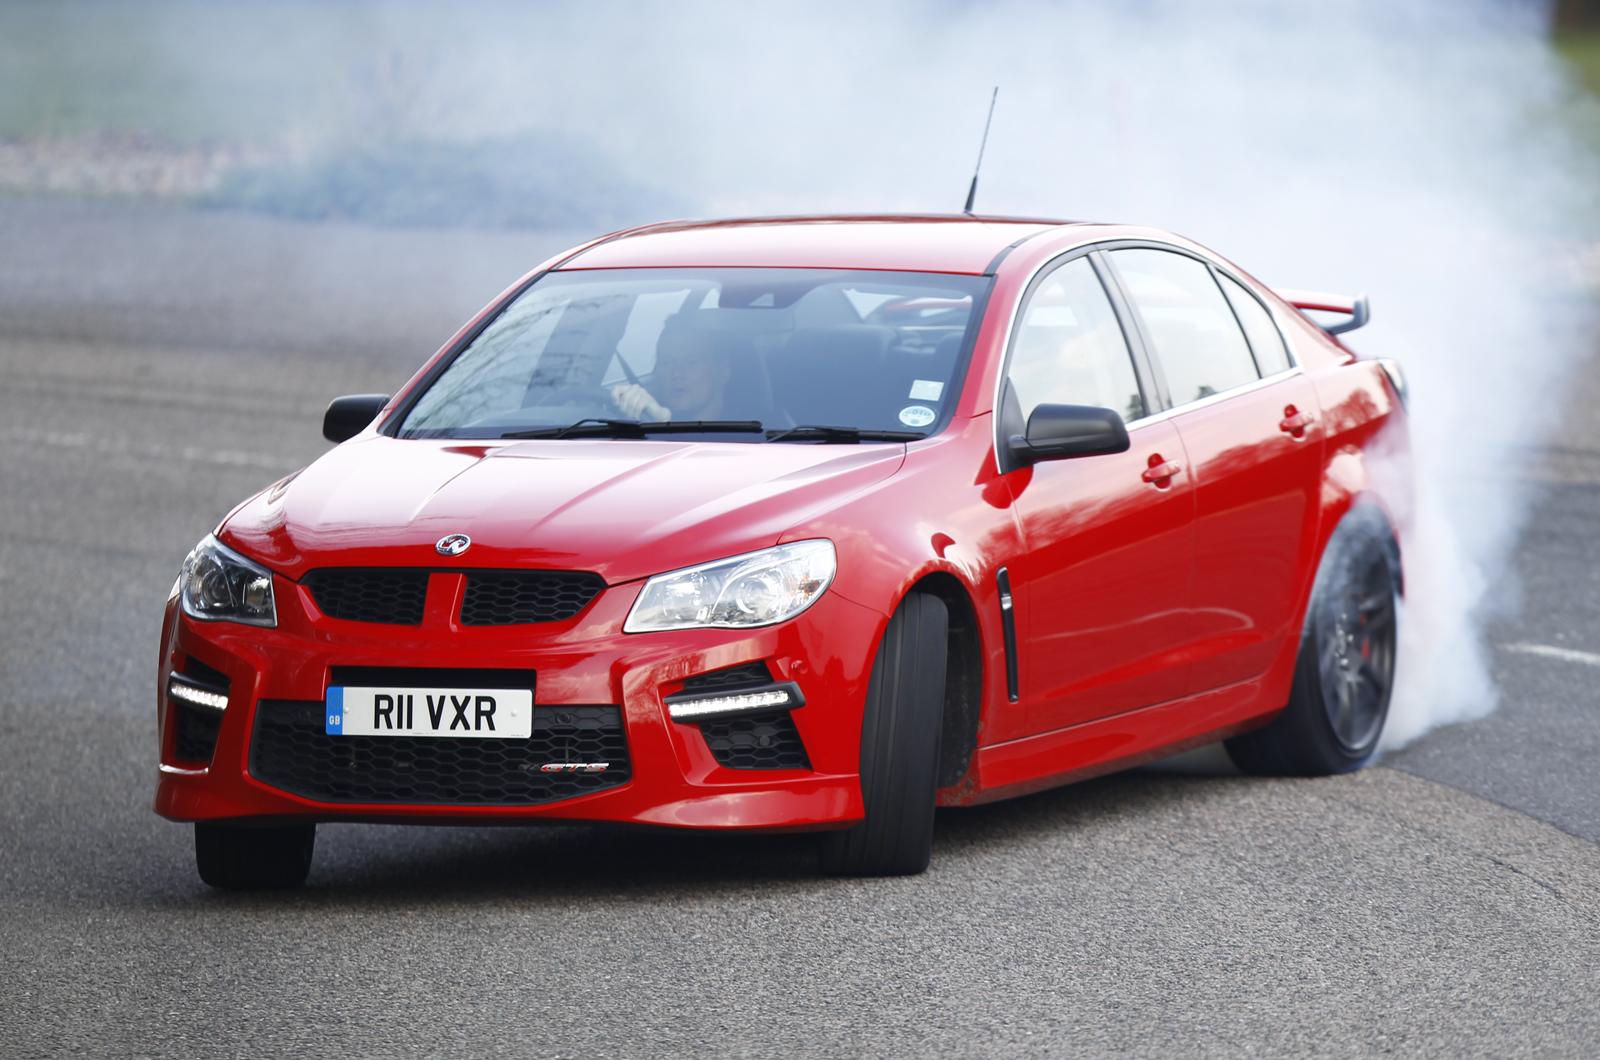 Vauxhall vauxhall vxr8 estate : Vauxhall VXR8 GTS Review (2017) | Autocar